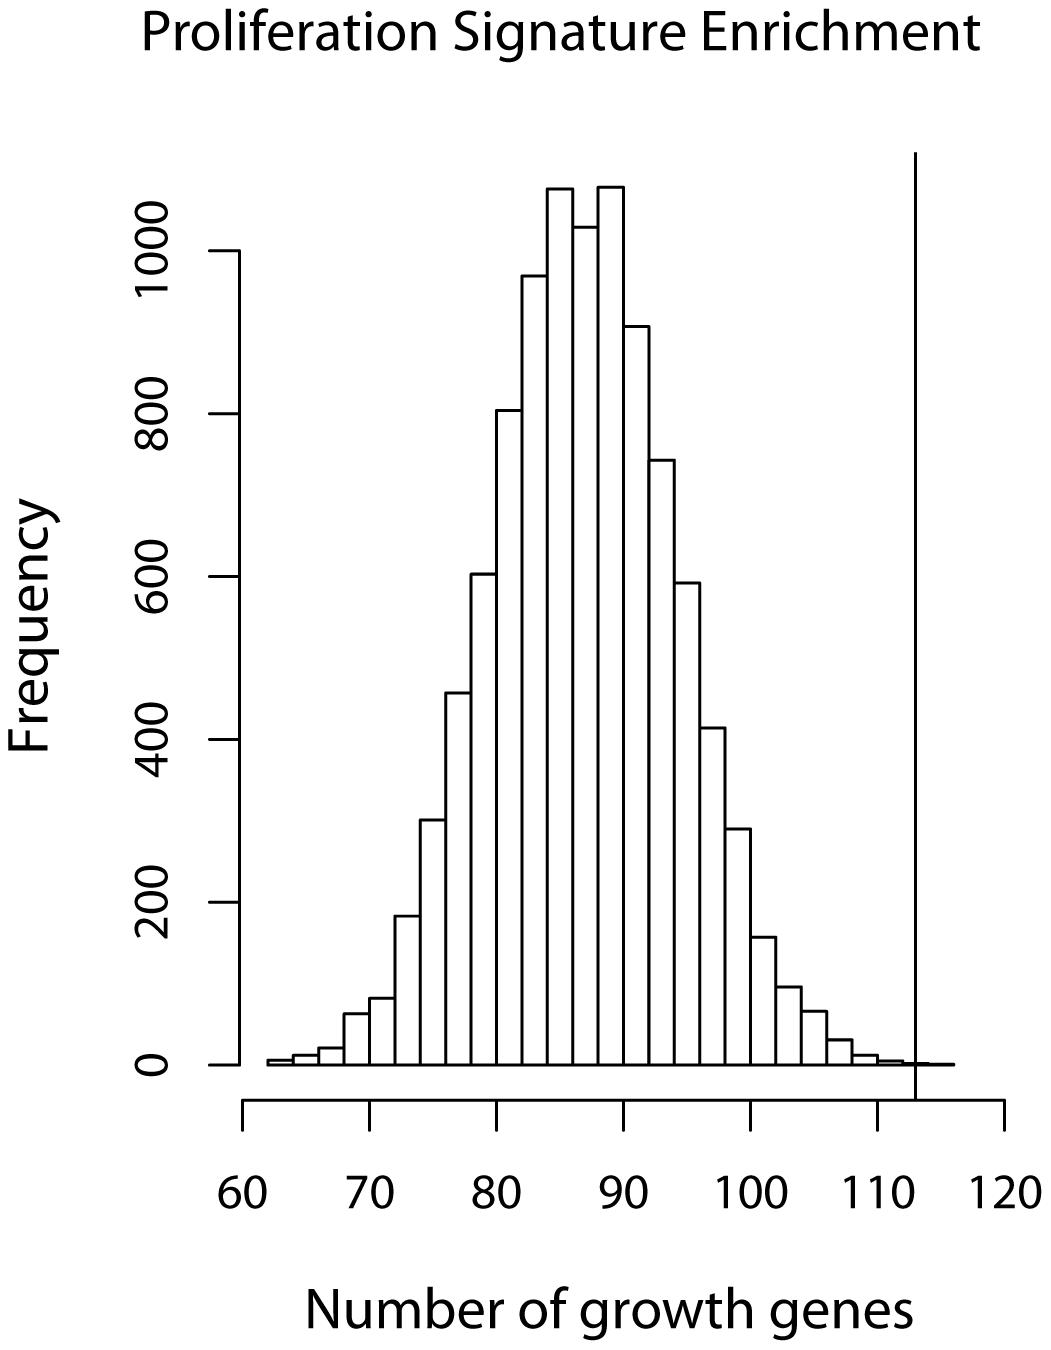 Growth gene overlap with Wirapati et al's proliferation signature.